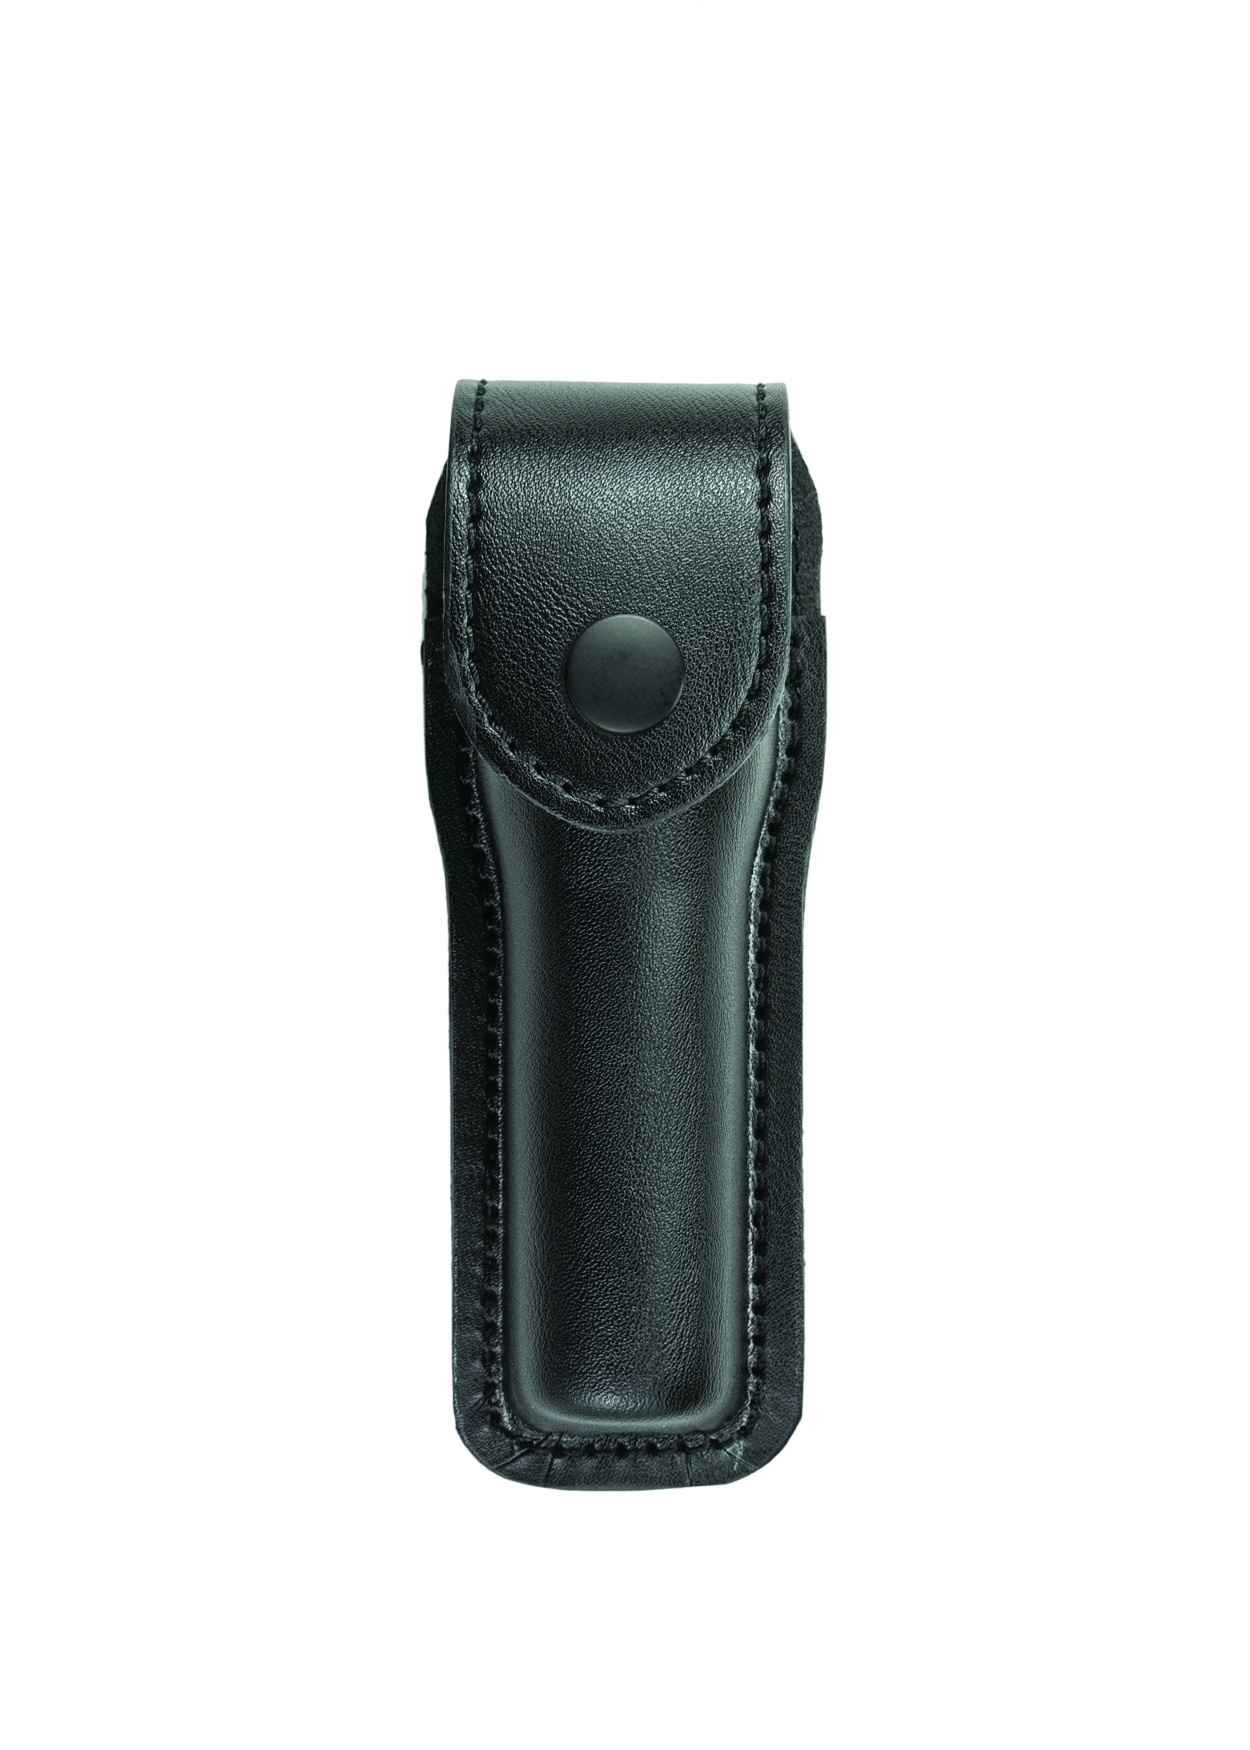 Flashlight Case, Small, AirTek, Smooth, Black Snap-